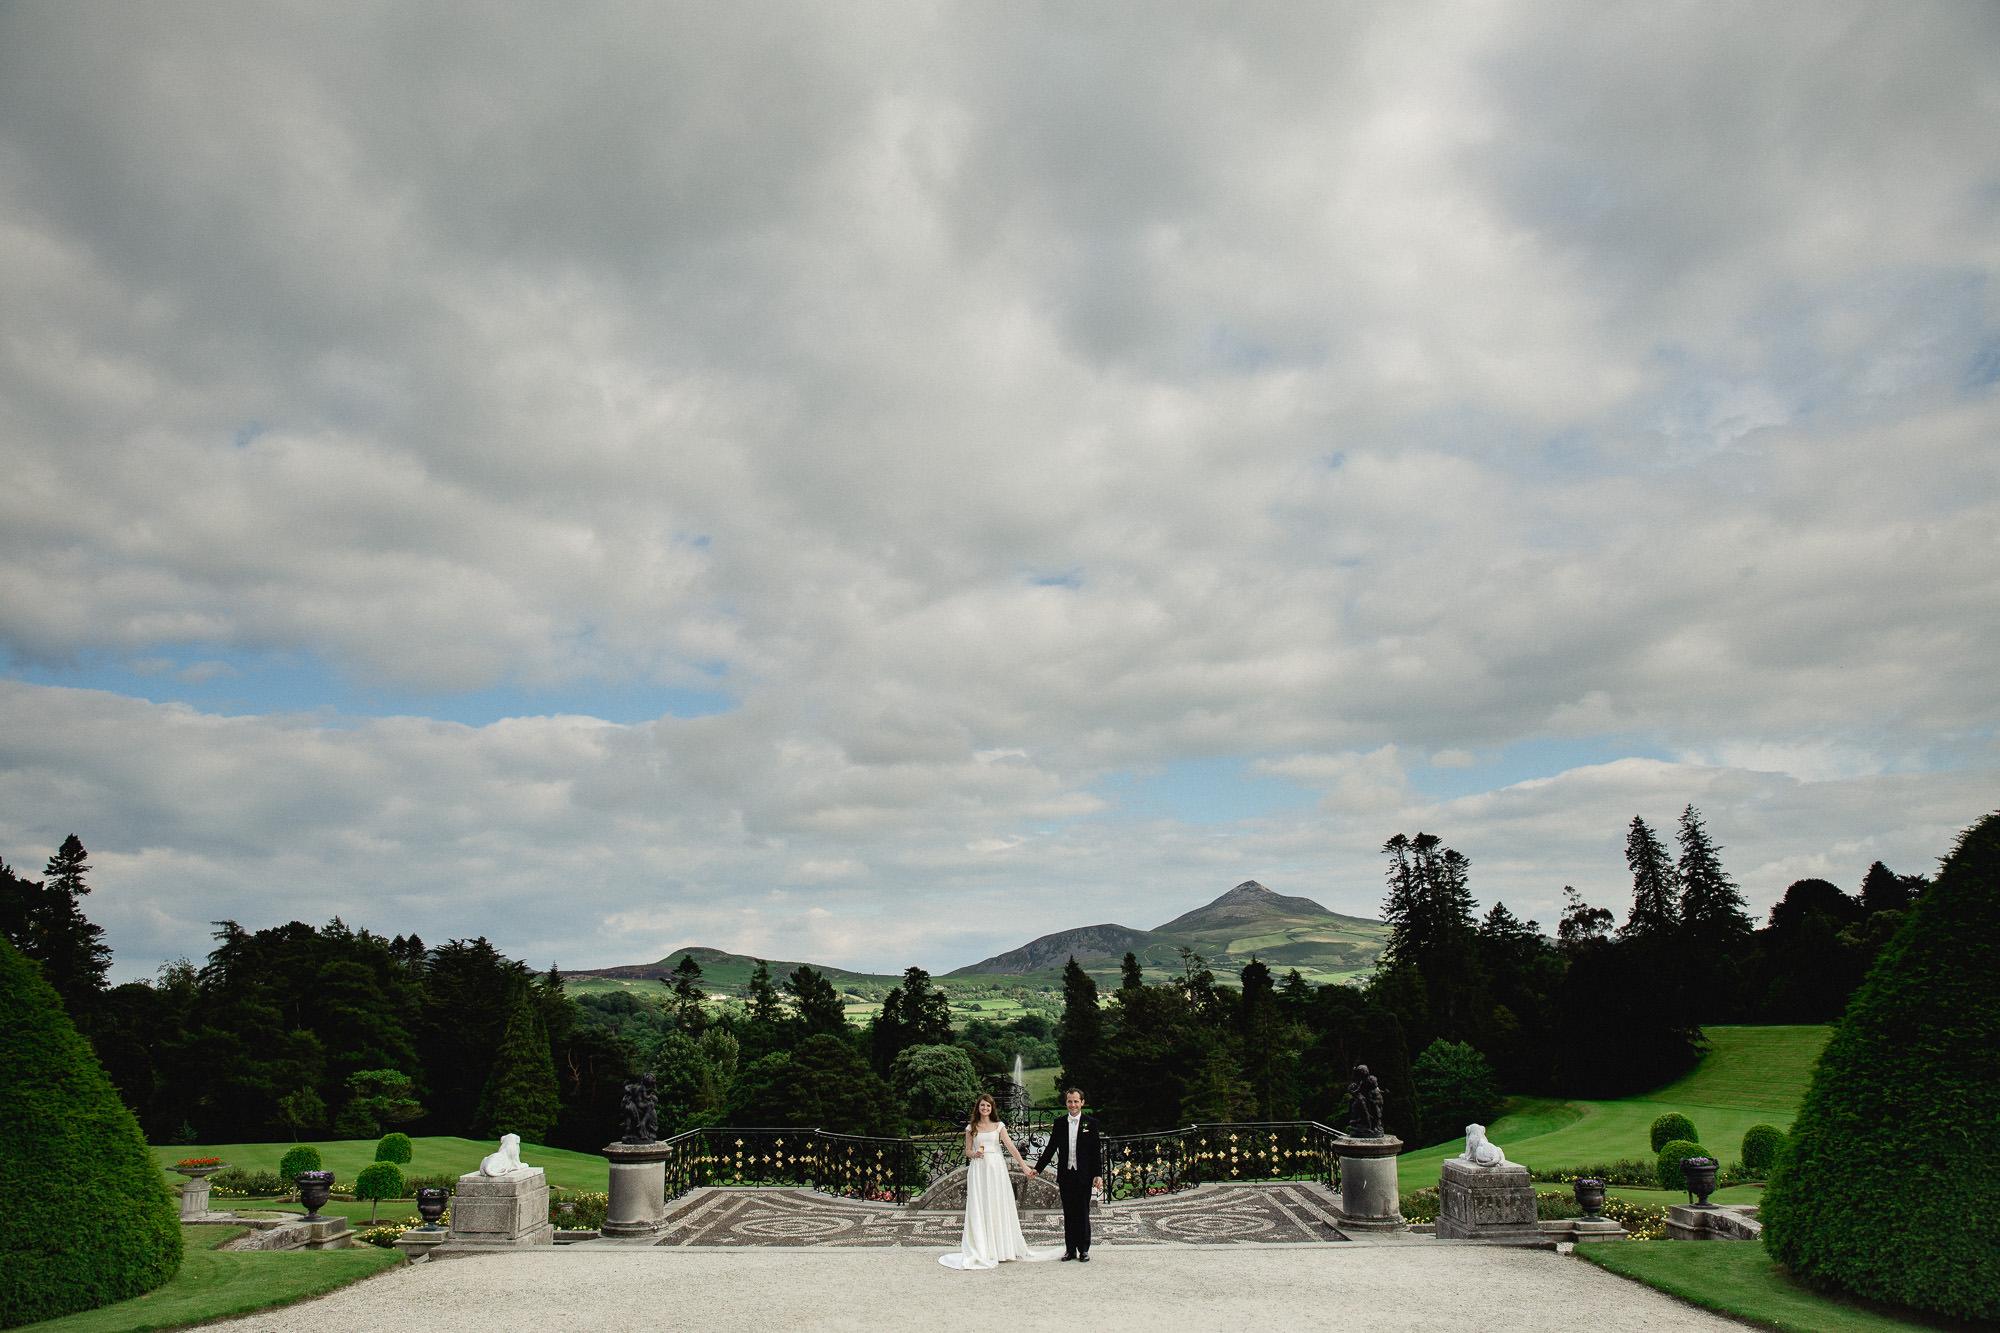 clairebyrnephotography-wedding-Emma-Max-21.jpg